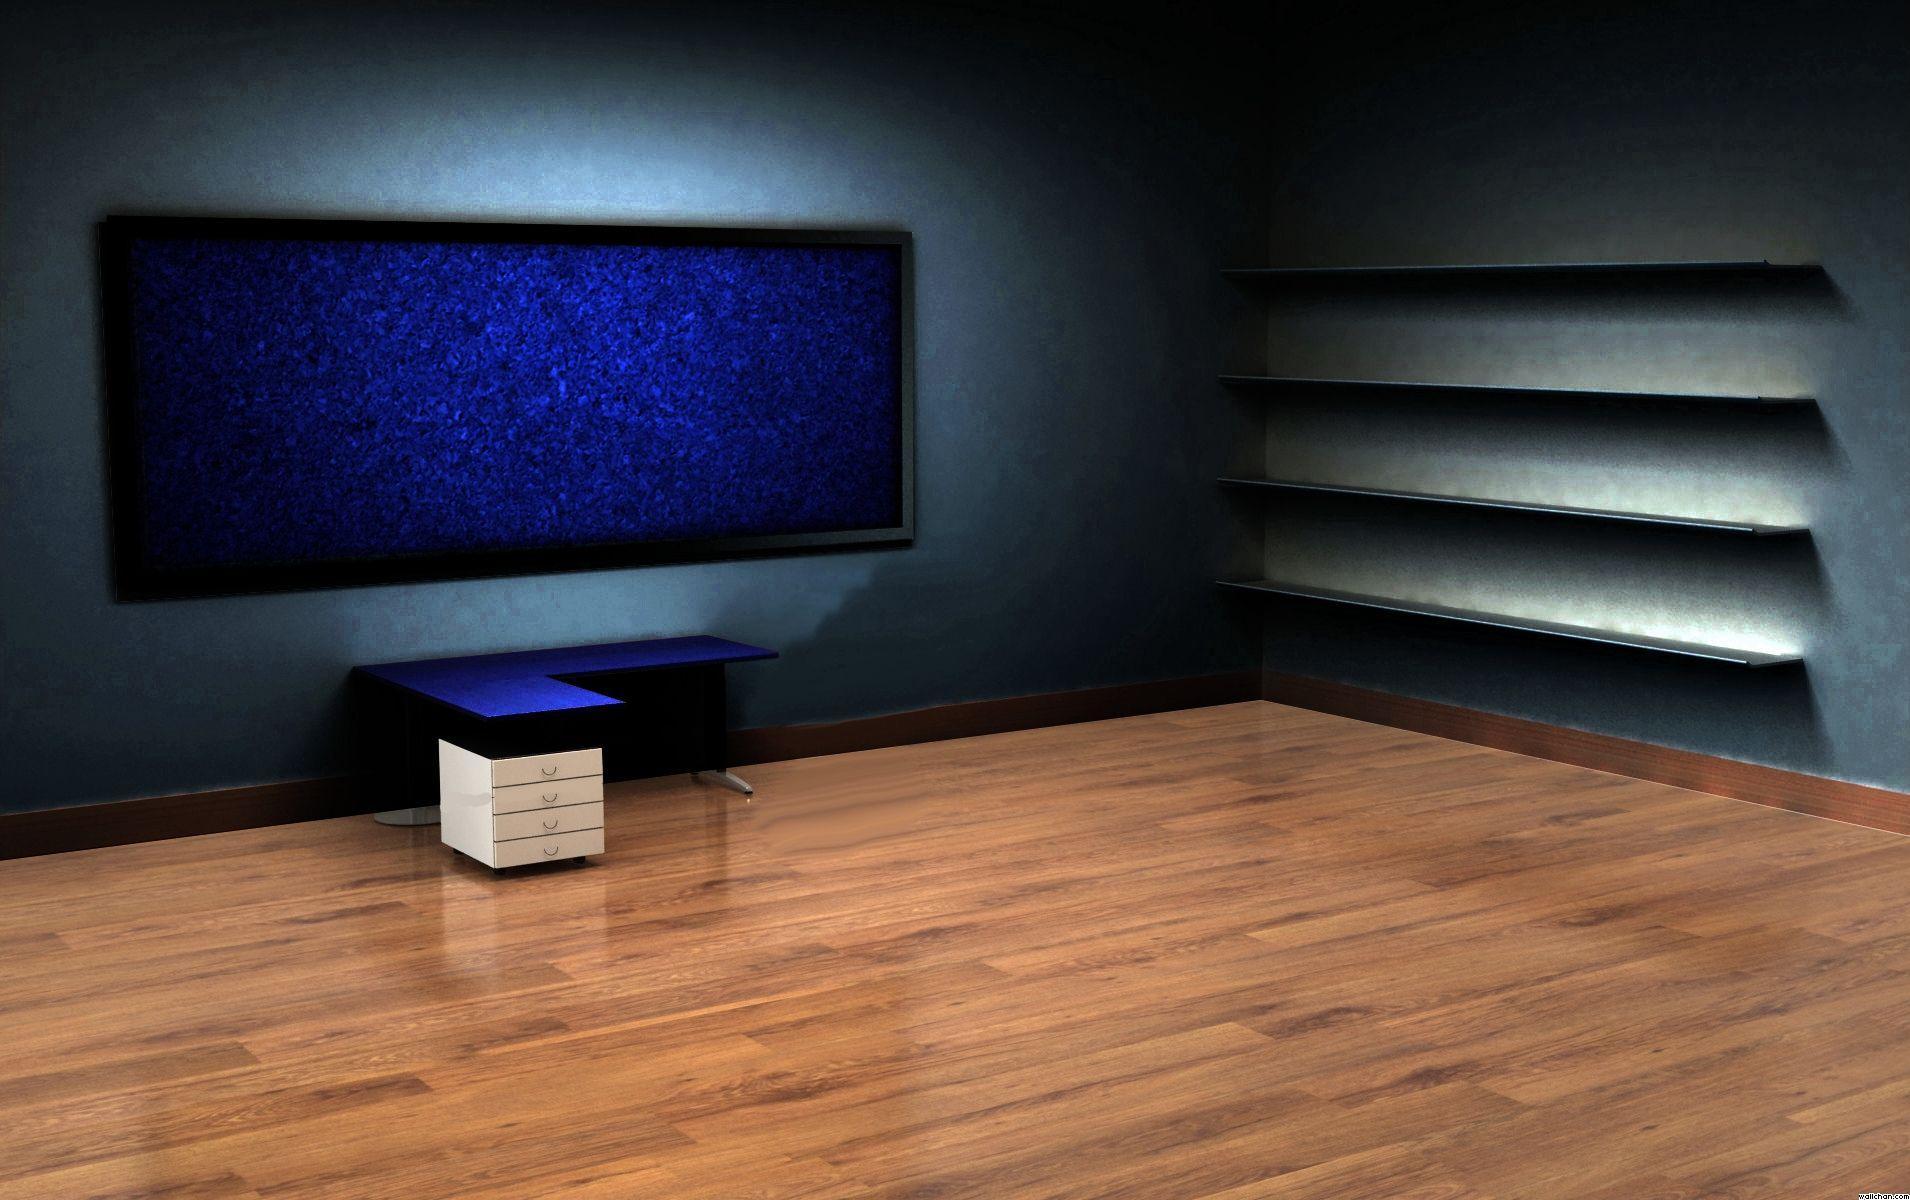 Shelf Desktop Wallpapers Top Free Shelf Desktop Backgrounds